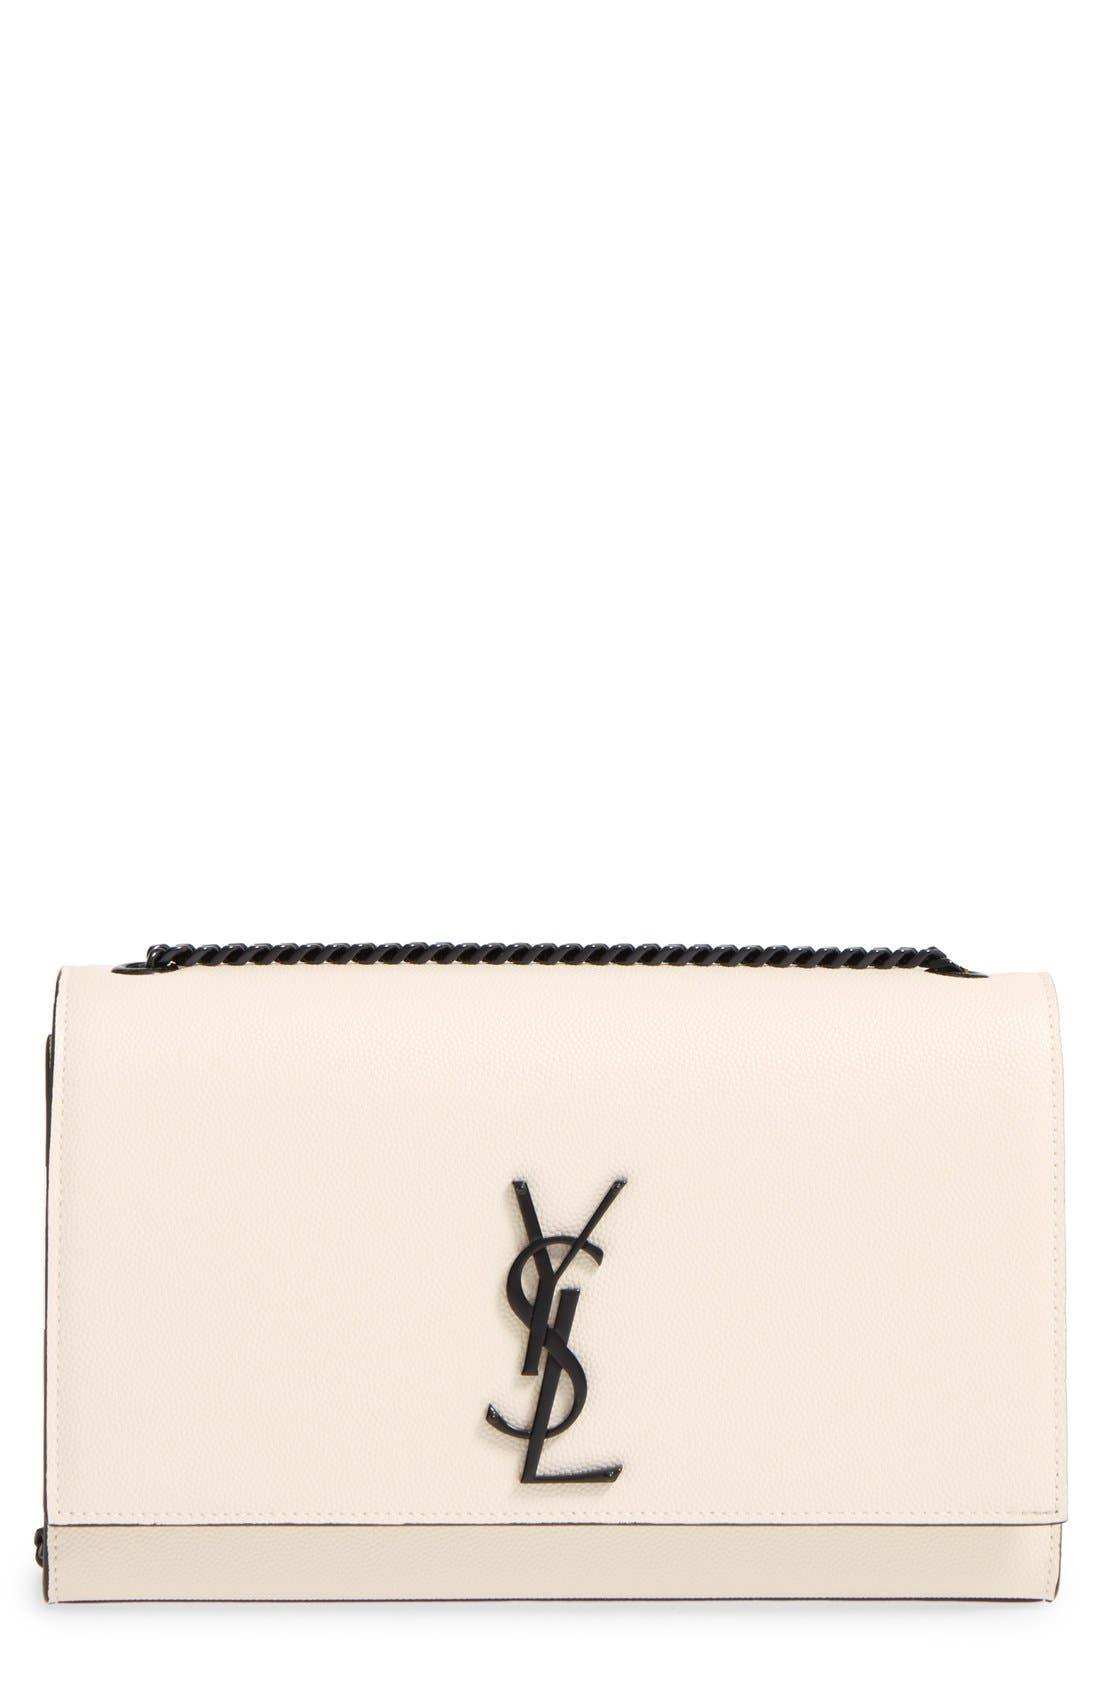 Alternate Image 1 Selected - Saint Laurent 'Medium Kate' Calfskin Leather Crossbody Bag